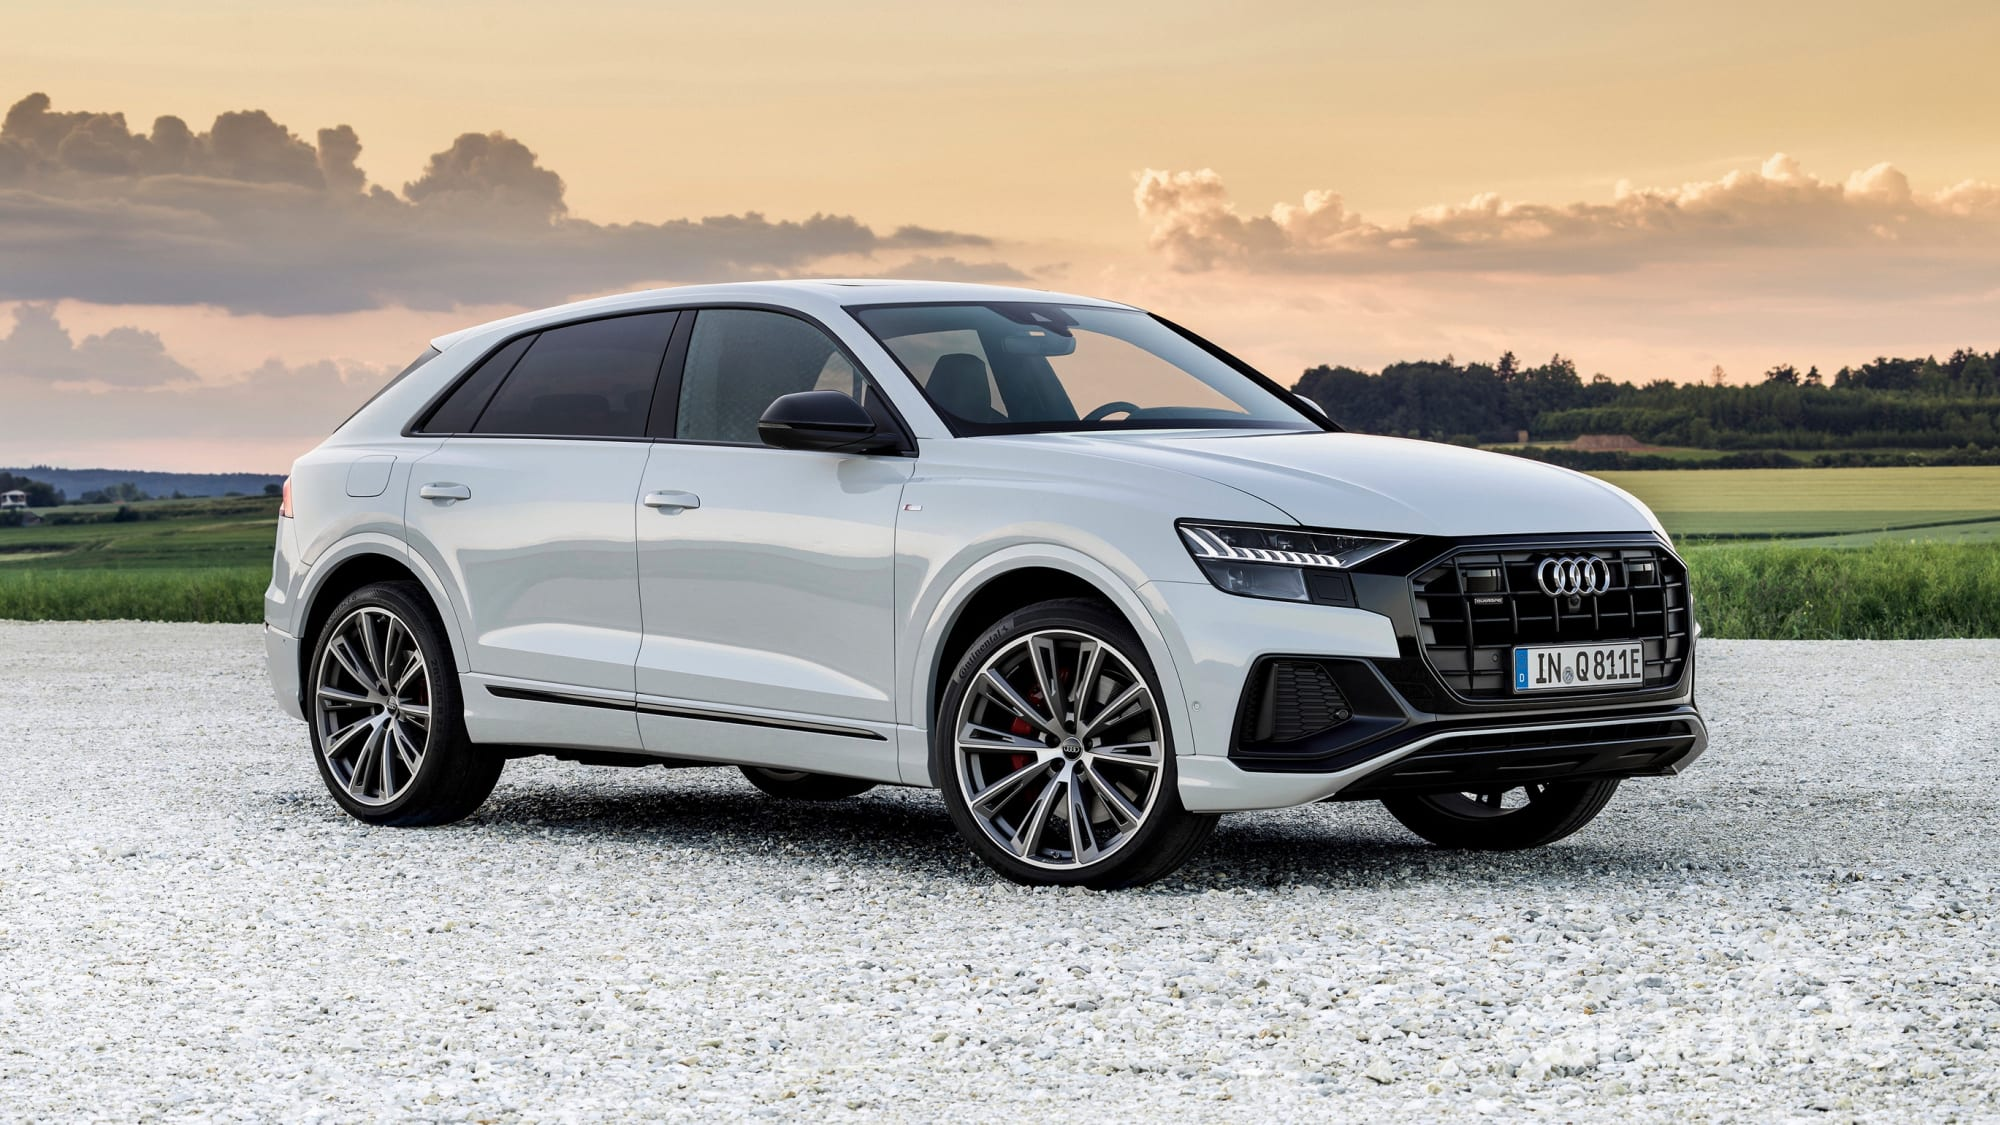 2021 Audi Q8 TFSIe Quattro: luxury plug-in hybrid SUV ...